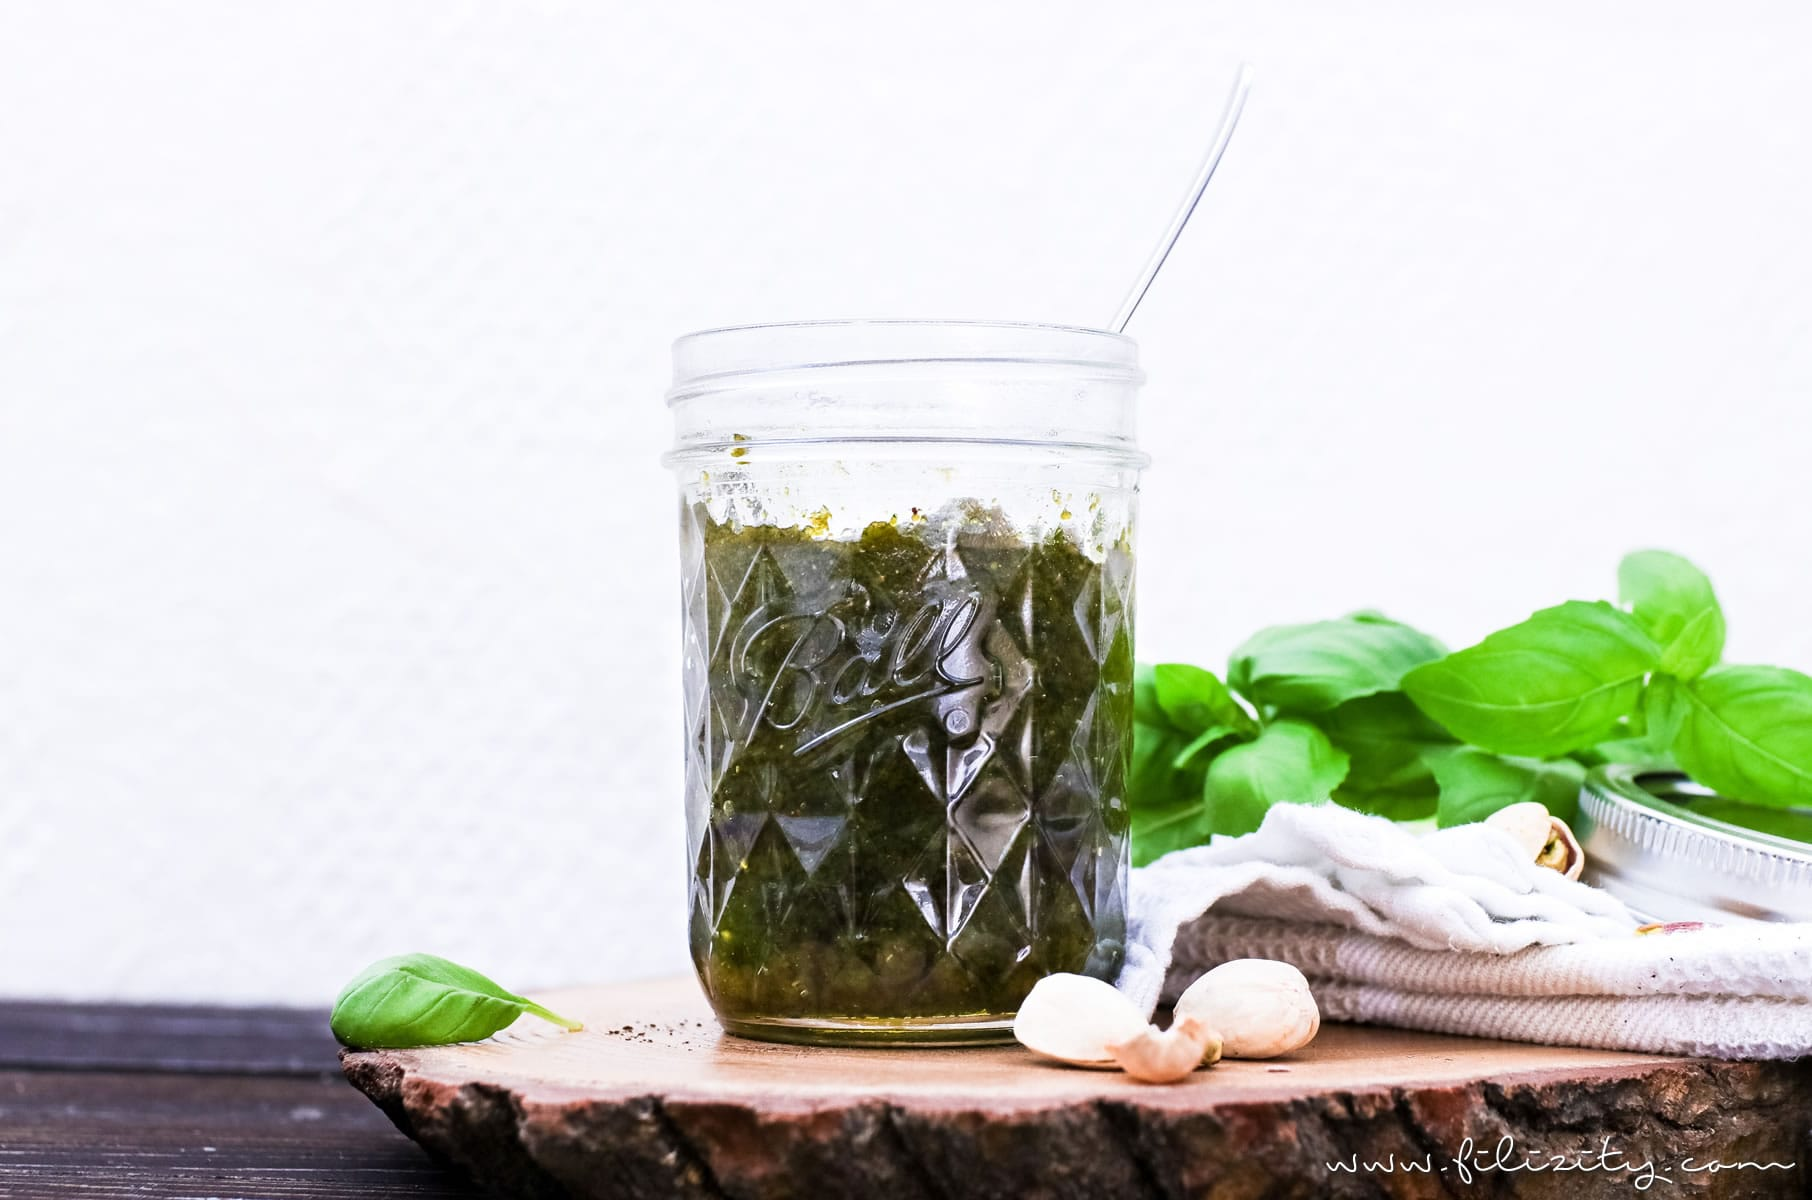 Himmlisches Pesto Rezept: Pistazien-Basilikum-Pesto selber machen